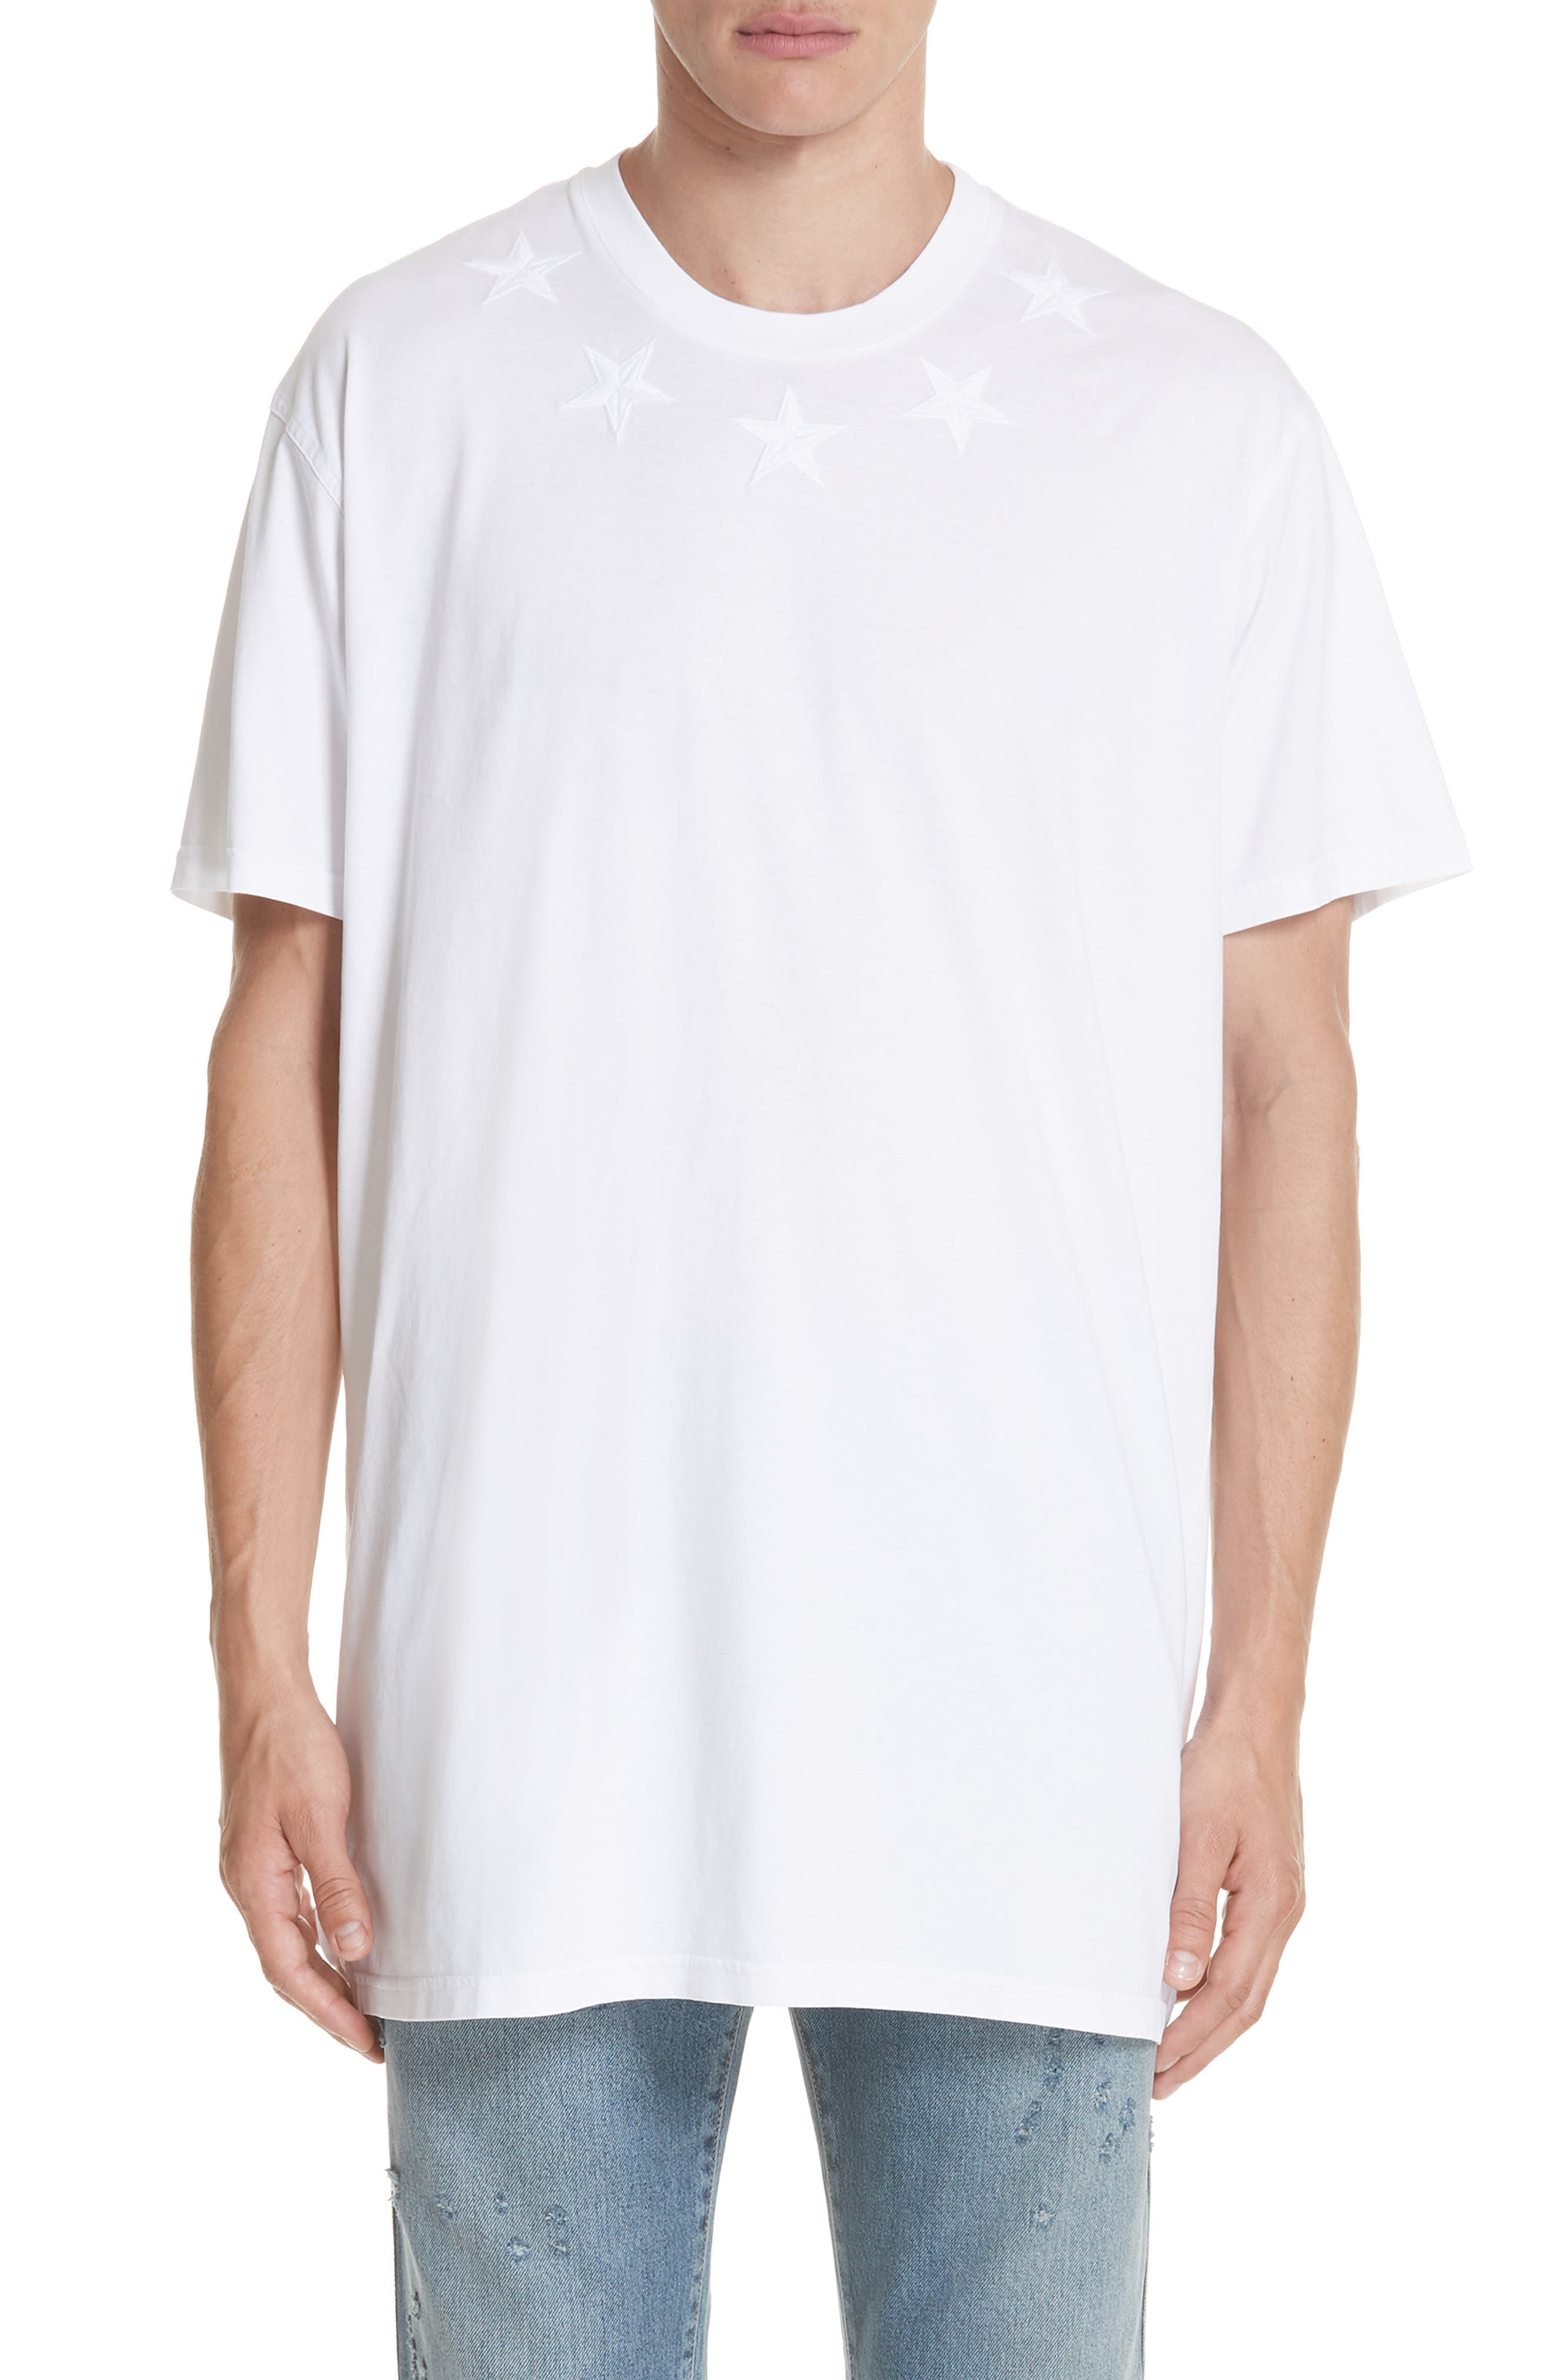 GIVENCHY,                             Star Appliqué T-Shirt,                             Main thumbnail 1, color,                             WHITE